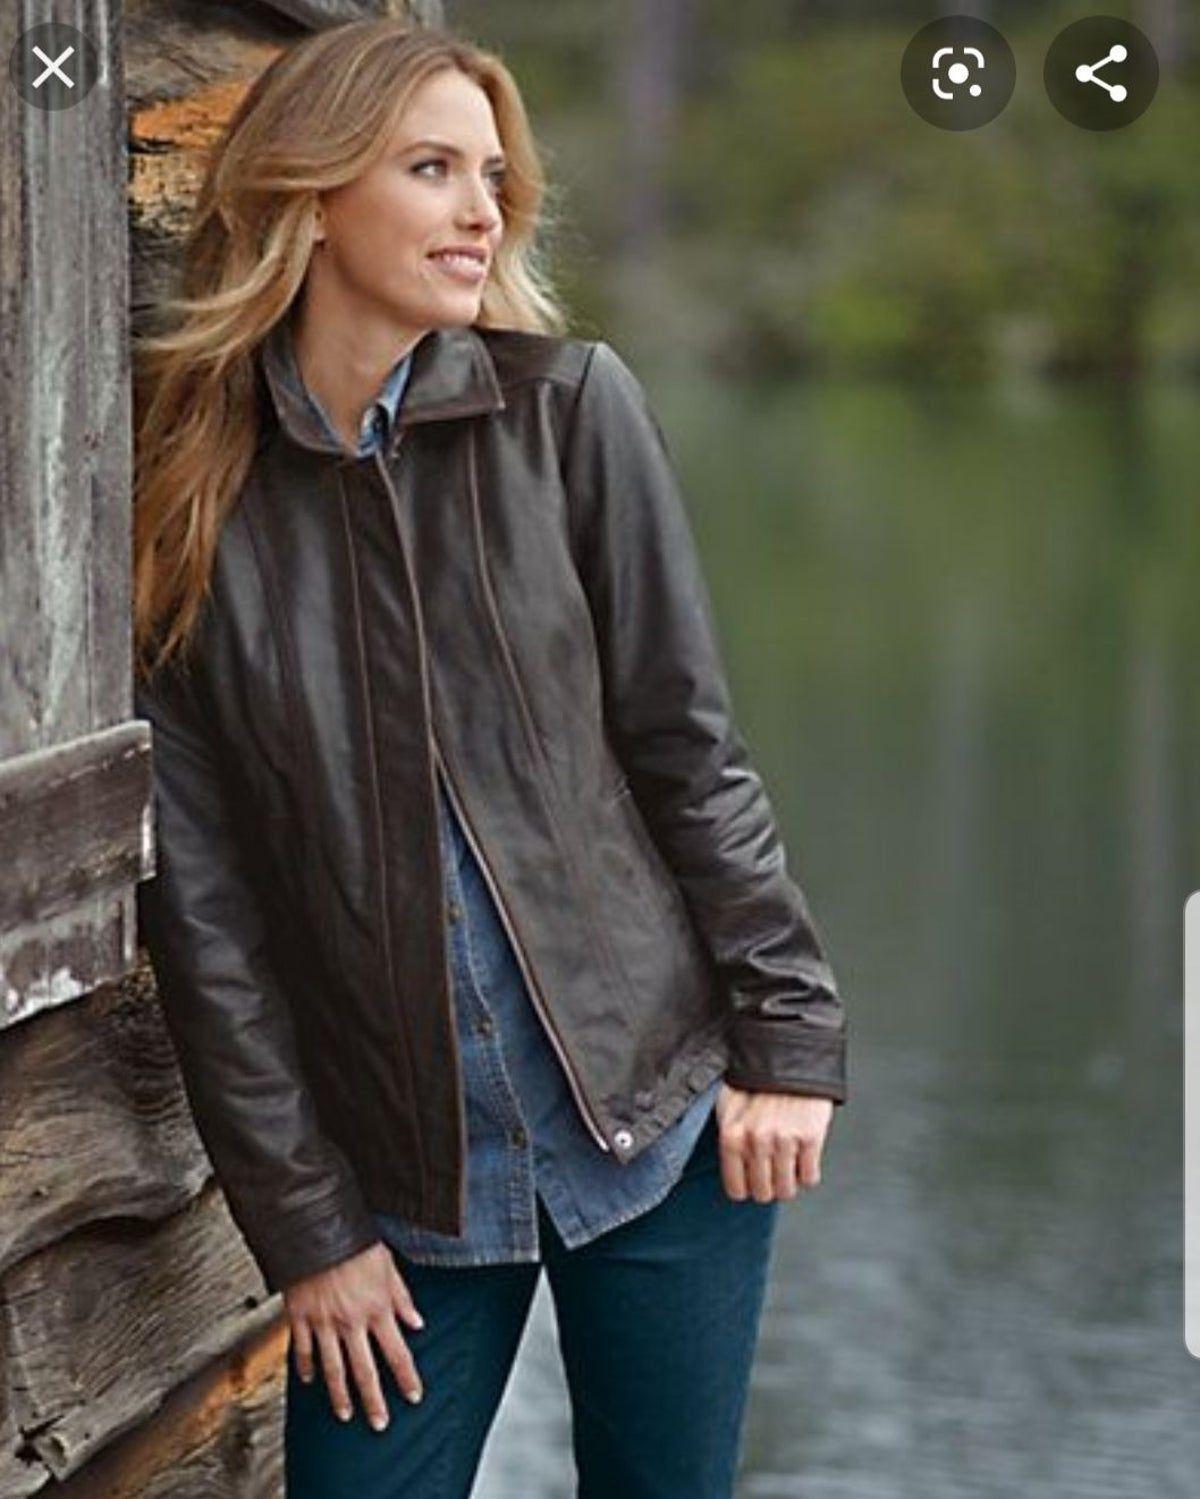 Eddie Bauer Leather Jacket Size Tall Xl Jackets Leather Jacket Dark Brown Leather Jacket [ 1499 x 1200 Pixel ]